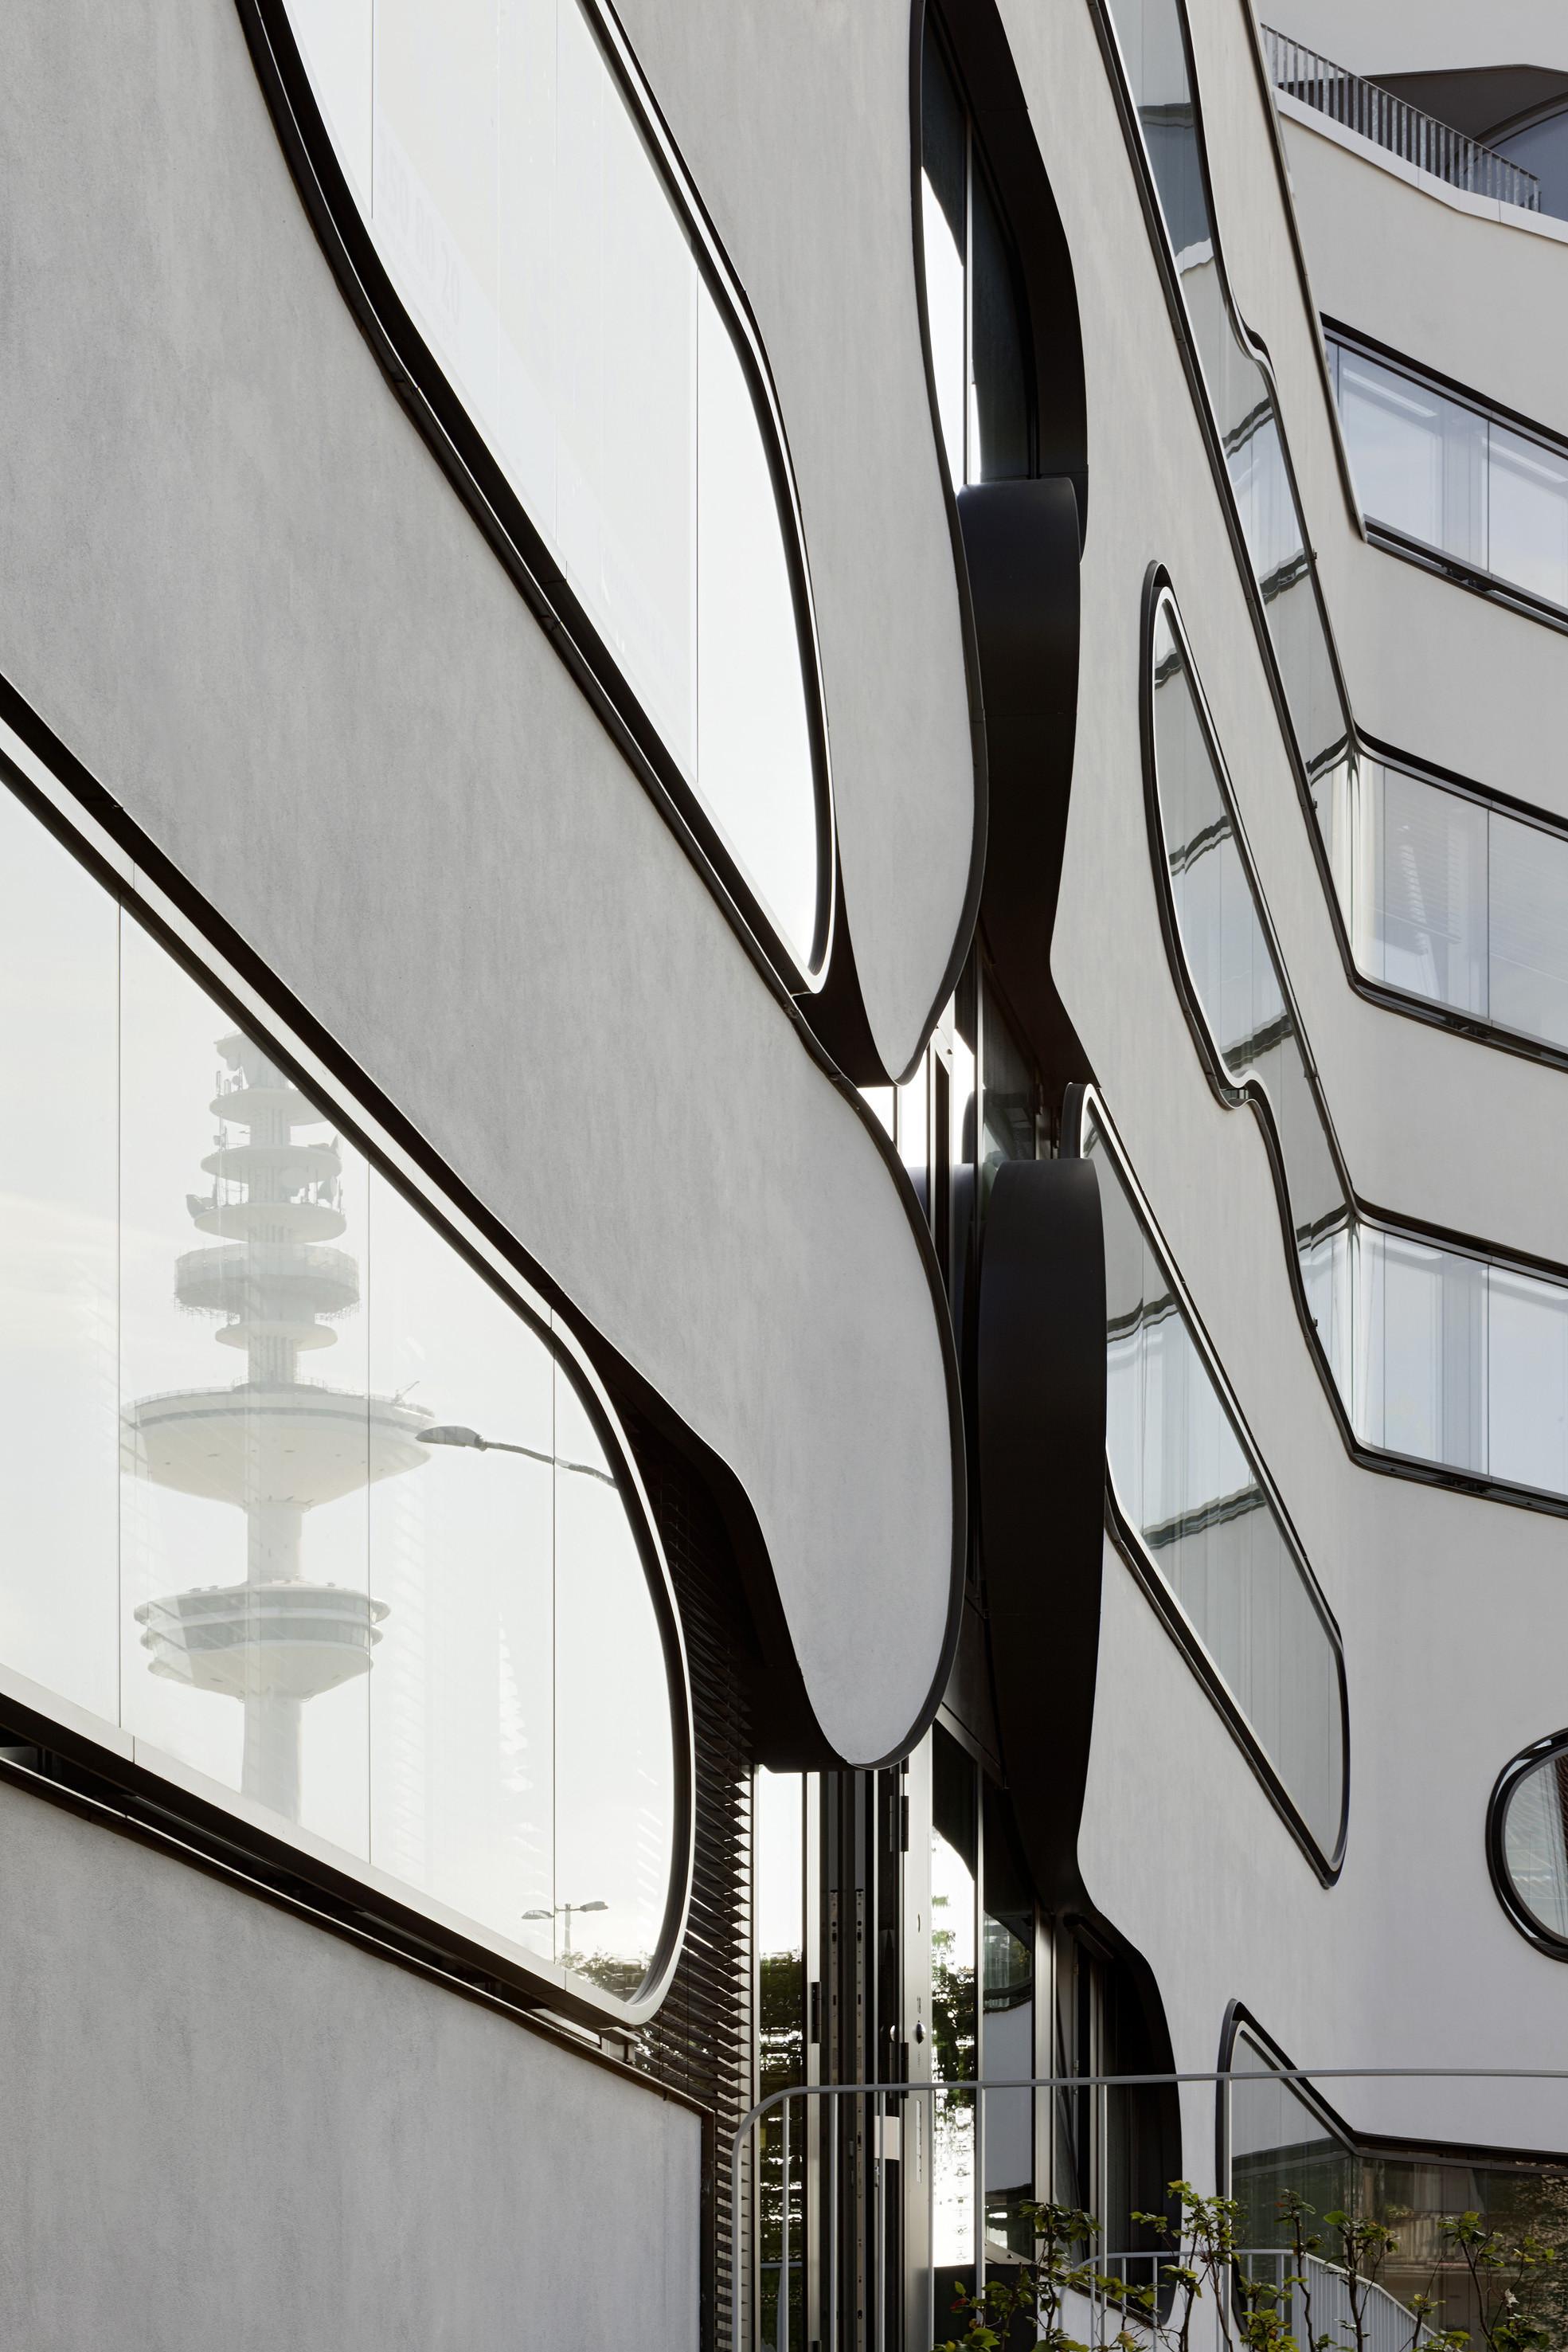 Schlump ONE / J. Mayer H. Architects